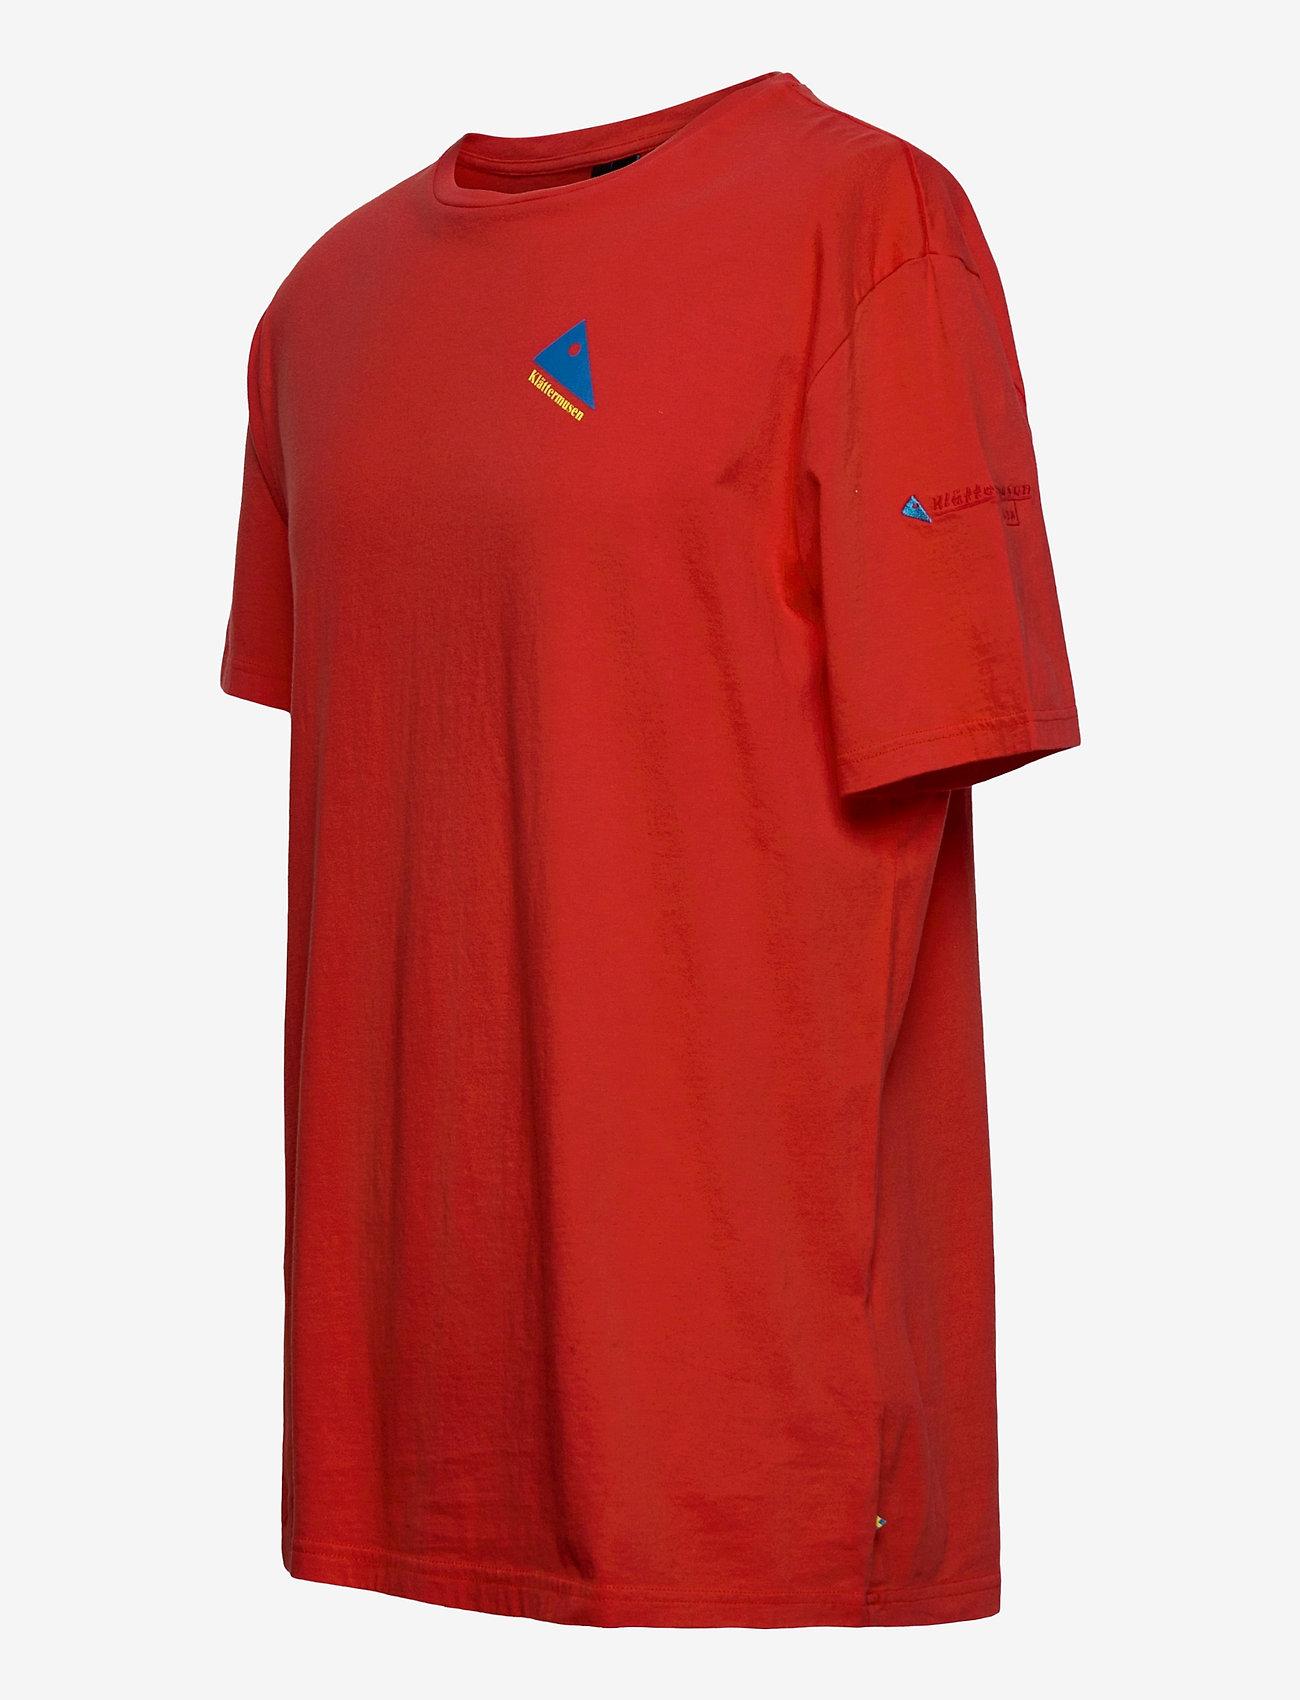 Klättermusen Verkstad 1980 SS Tee M's - T-skjorter MOLTEN LAVA - Menn Klær